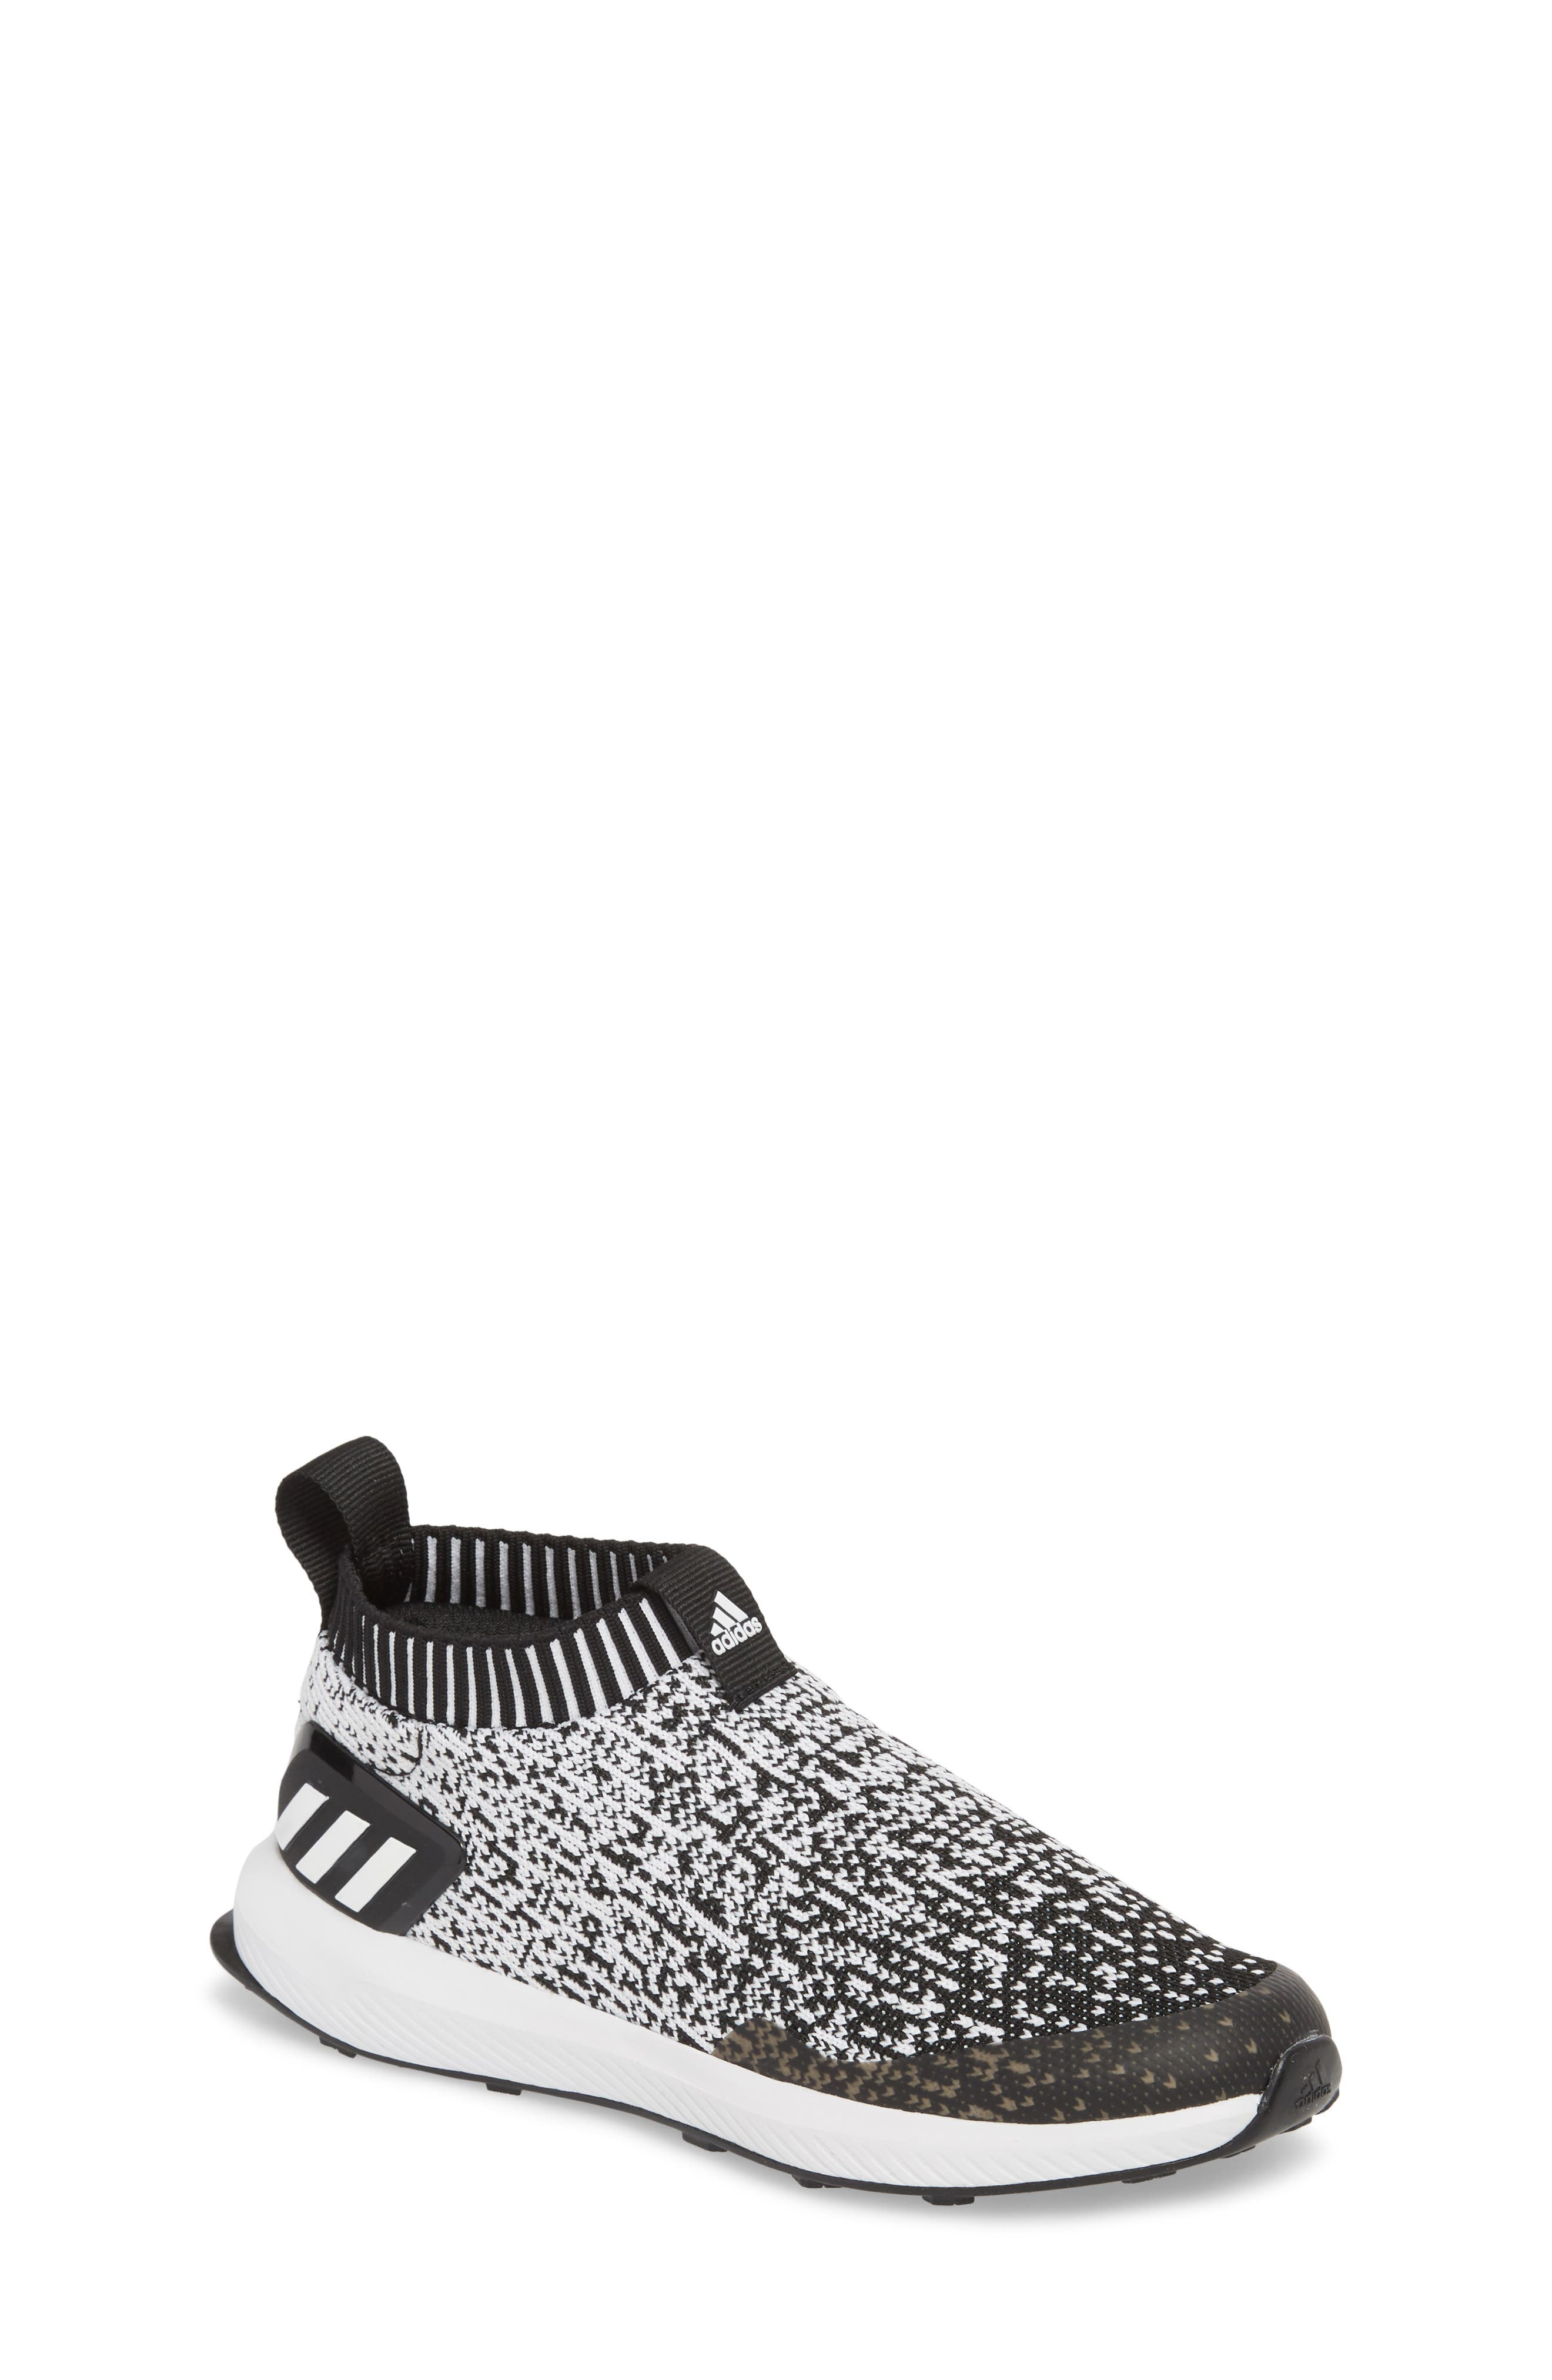 RapidaRun Laceless Knit Sneaker,                             Main thumbnail 1, color,                             001